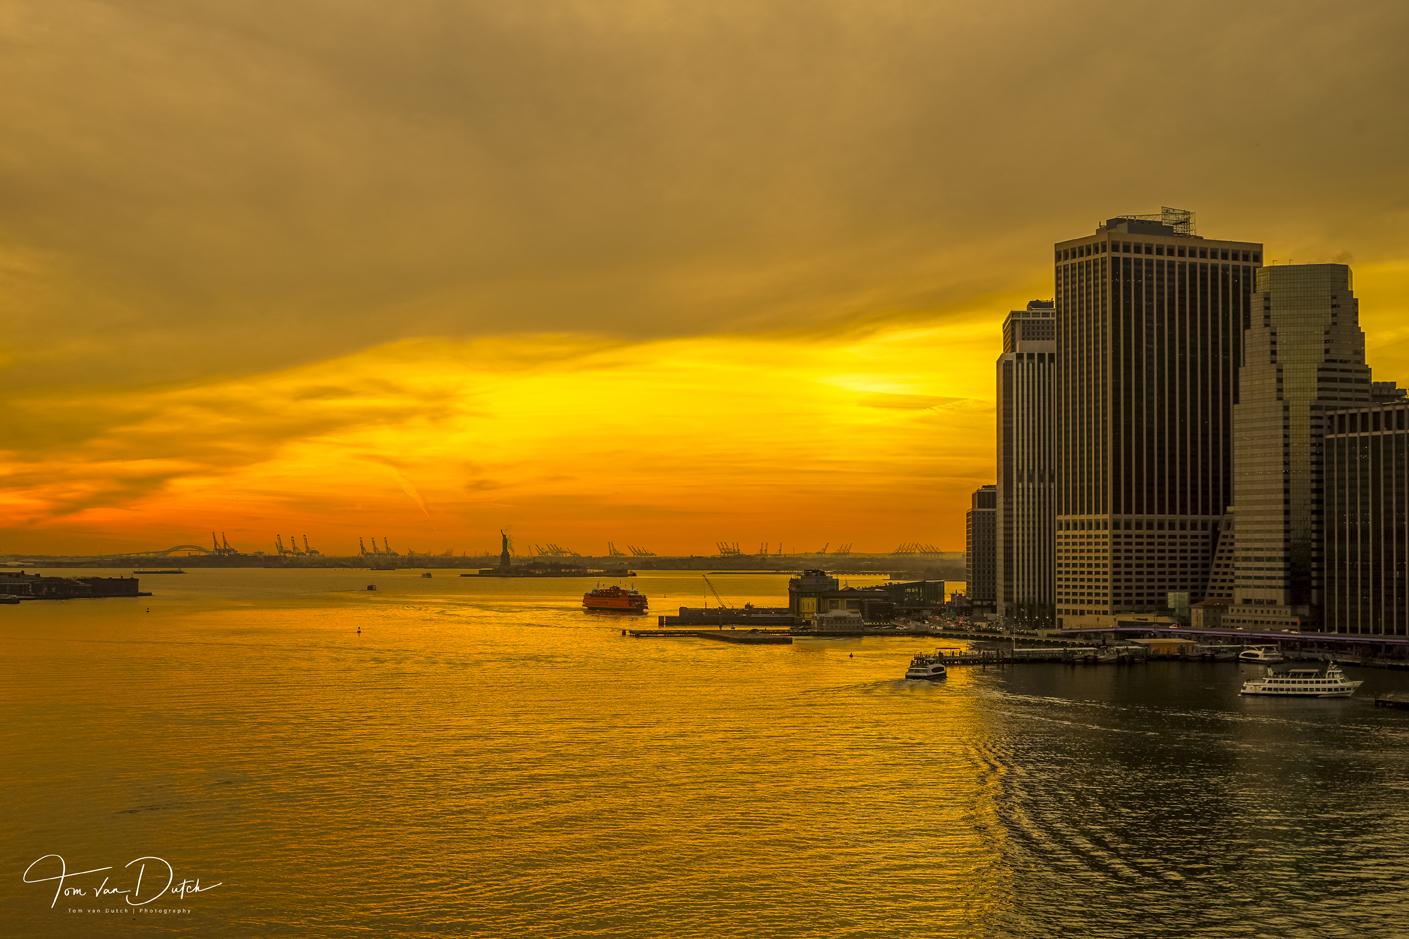 Brooklyn Bridge View, USA